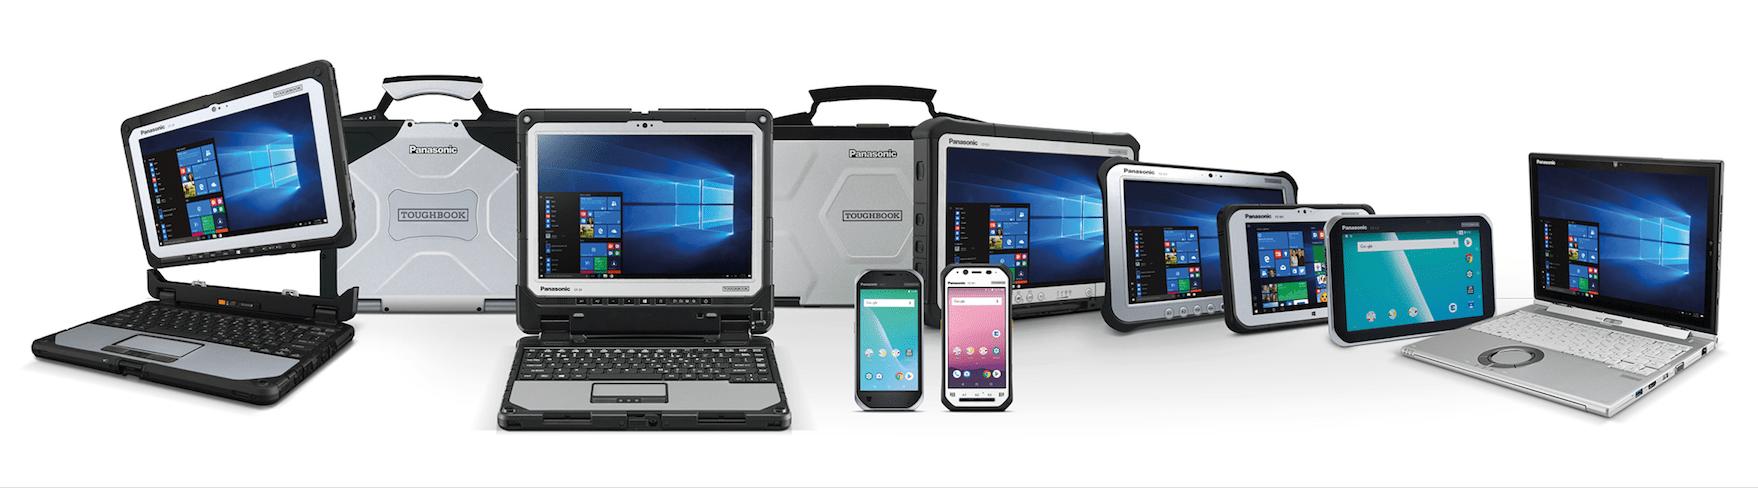 Panasonic lanserar COMPASS 2.0 nästa generations IT